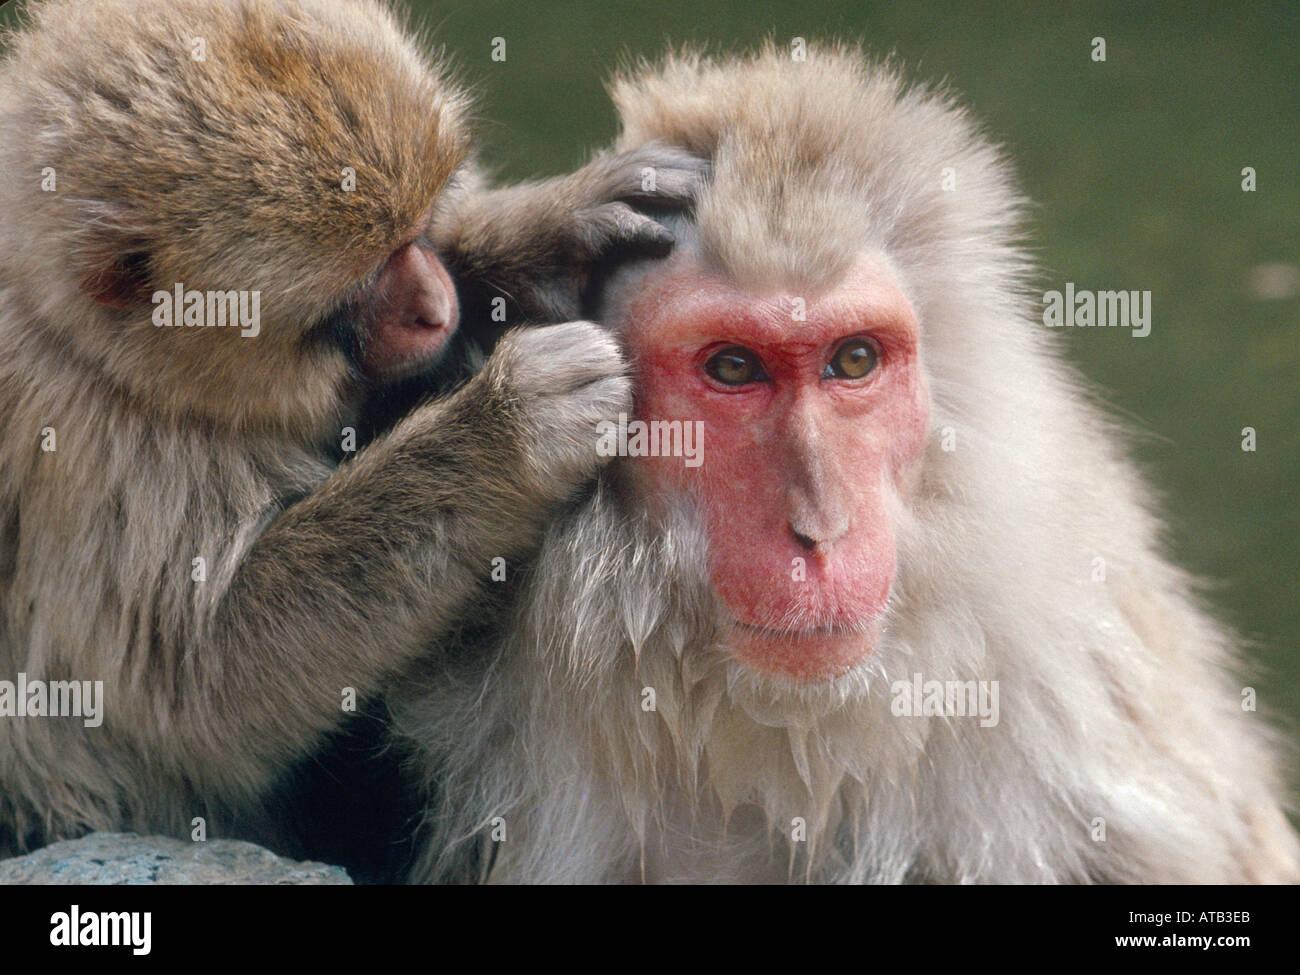 Los jóvenes macacos japoneses grooming hembra antiguo Imagen De Stock